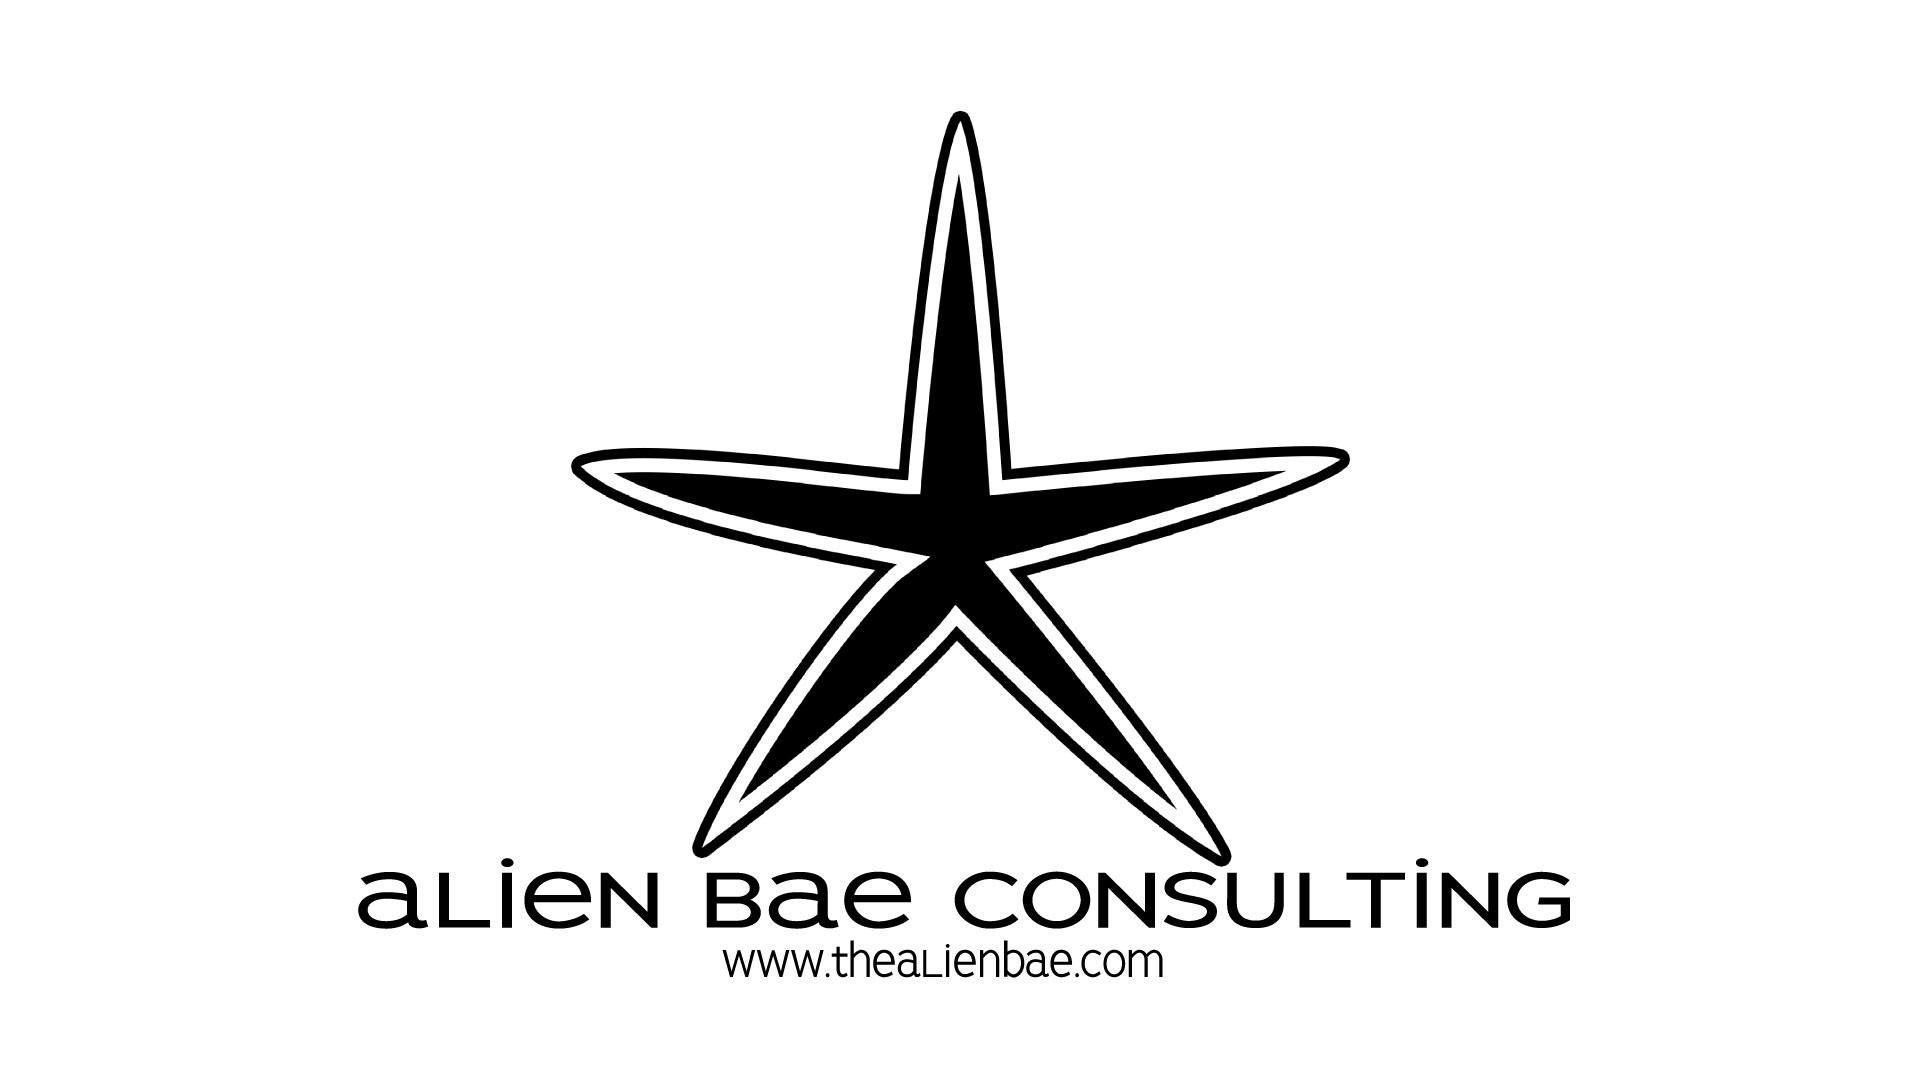 New Client Consultation